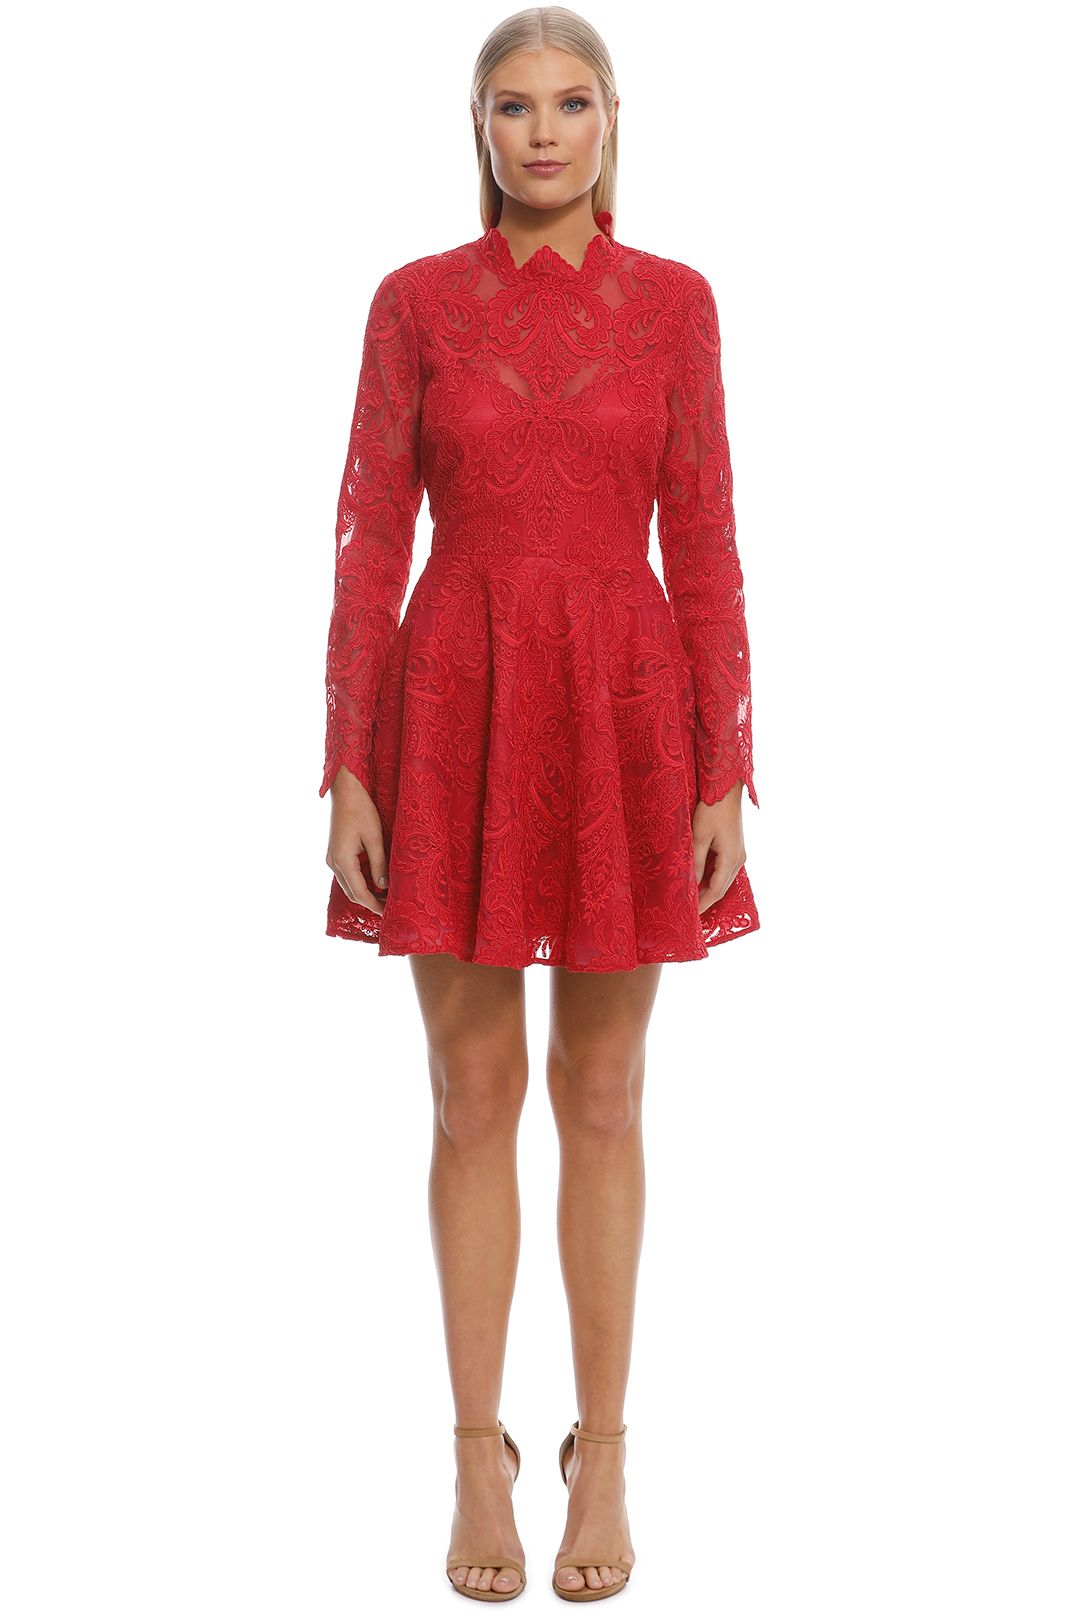 Saylor - Rita Dress - Raspberry - Front